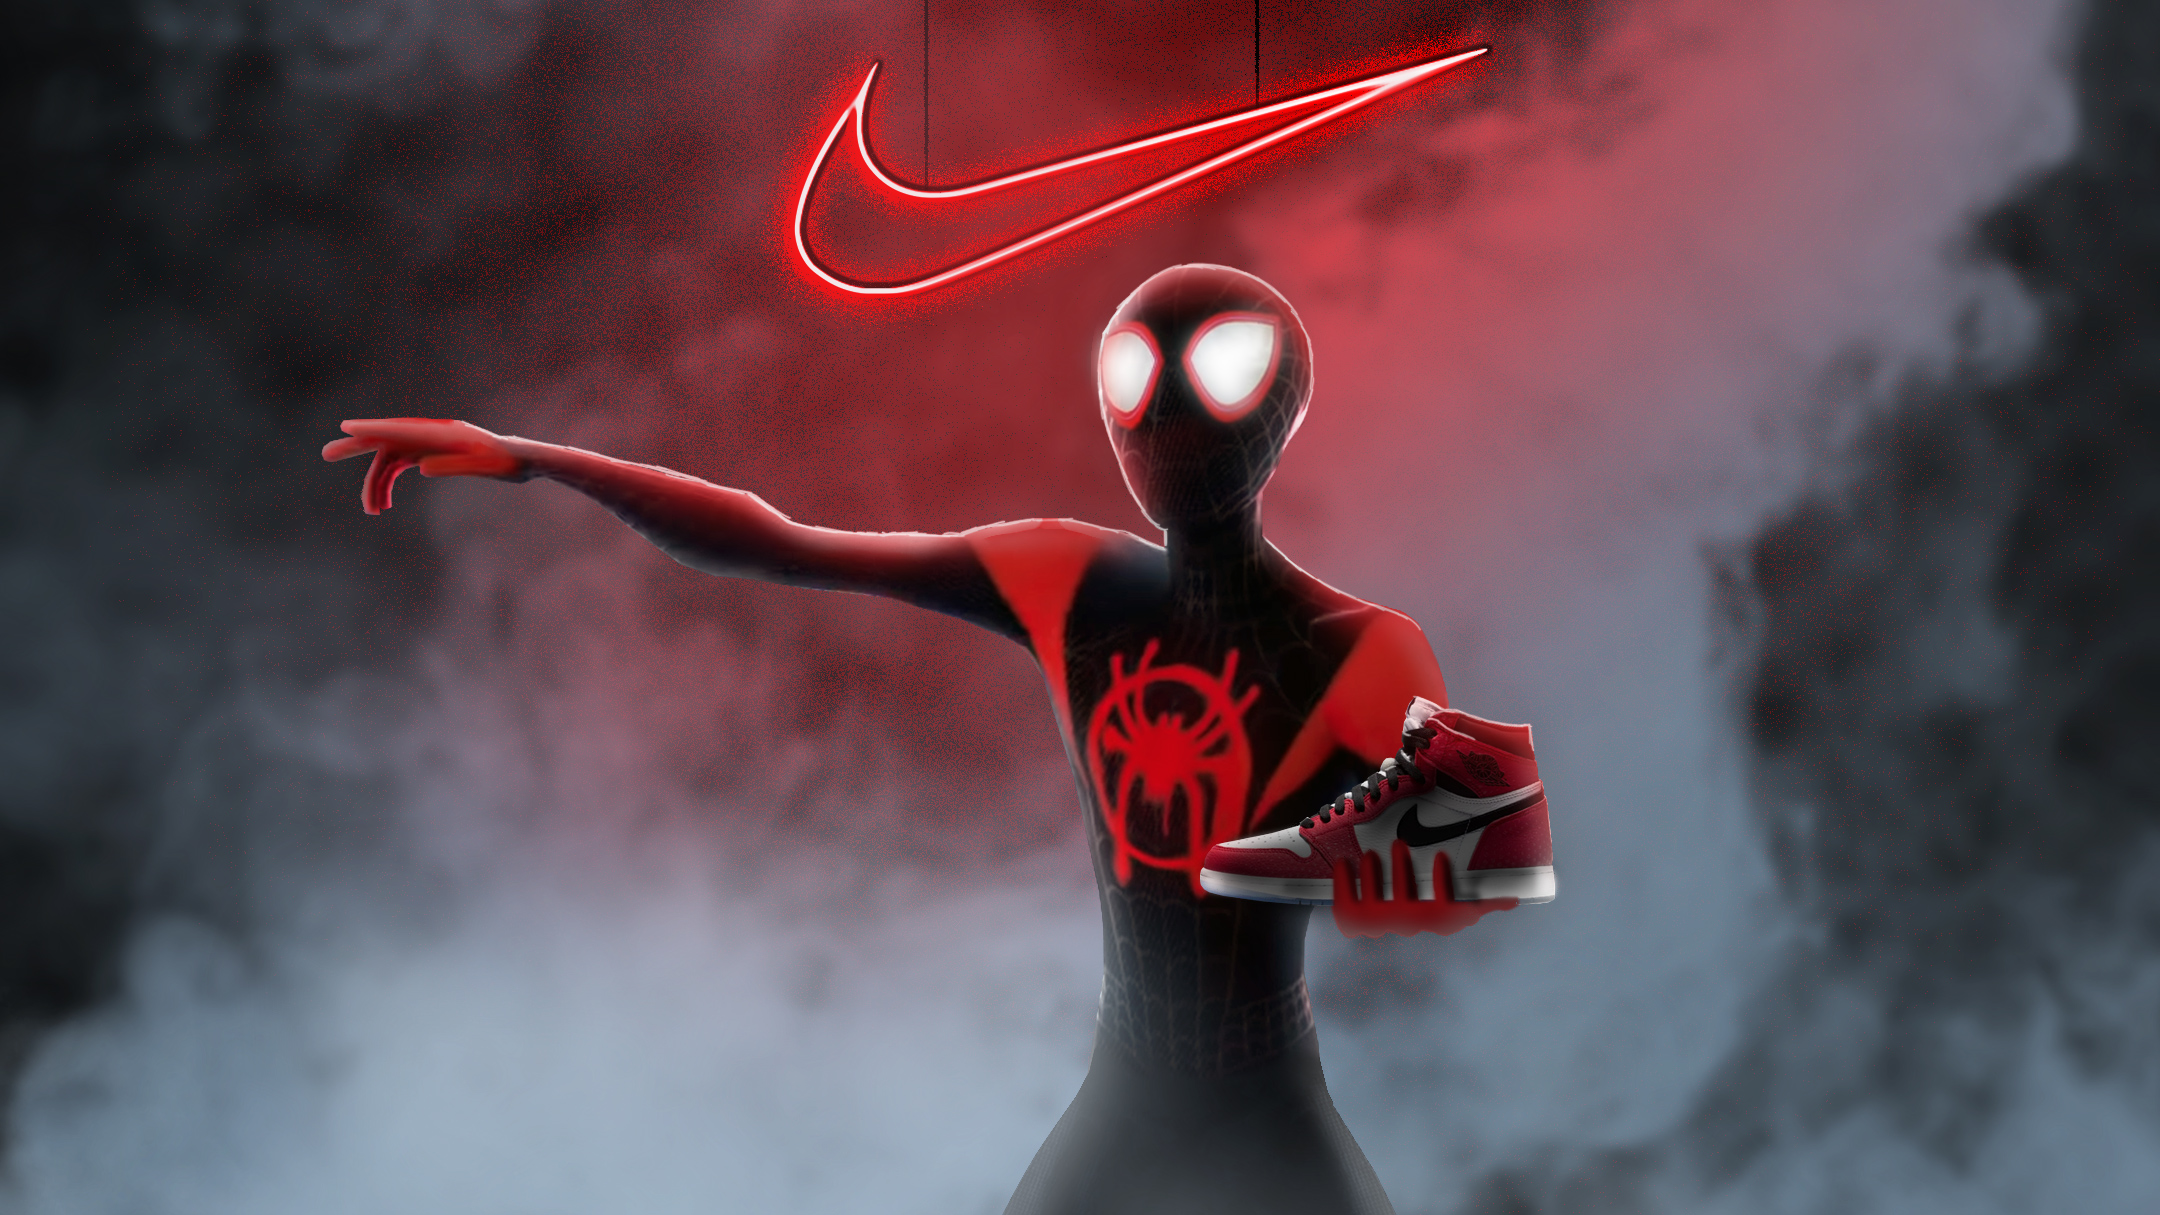 Salida hacia insalubre Humano  Spiderman Miles Morales Nike Air Jordan, HD Superheroes, 4k Wallpapers,  Images, Backgrounds, Photos and Pictures